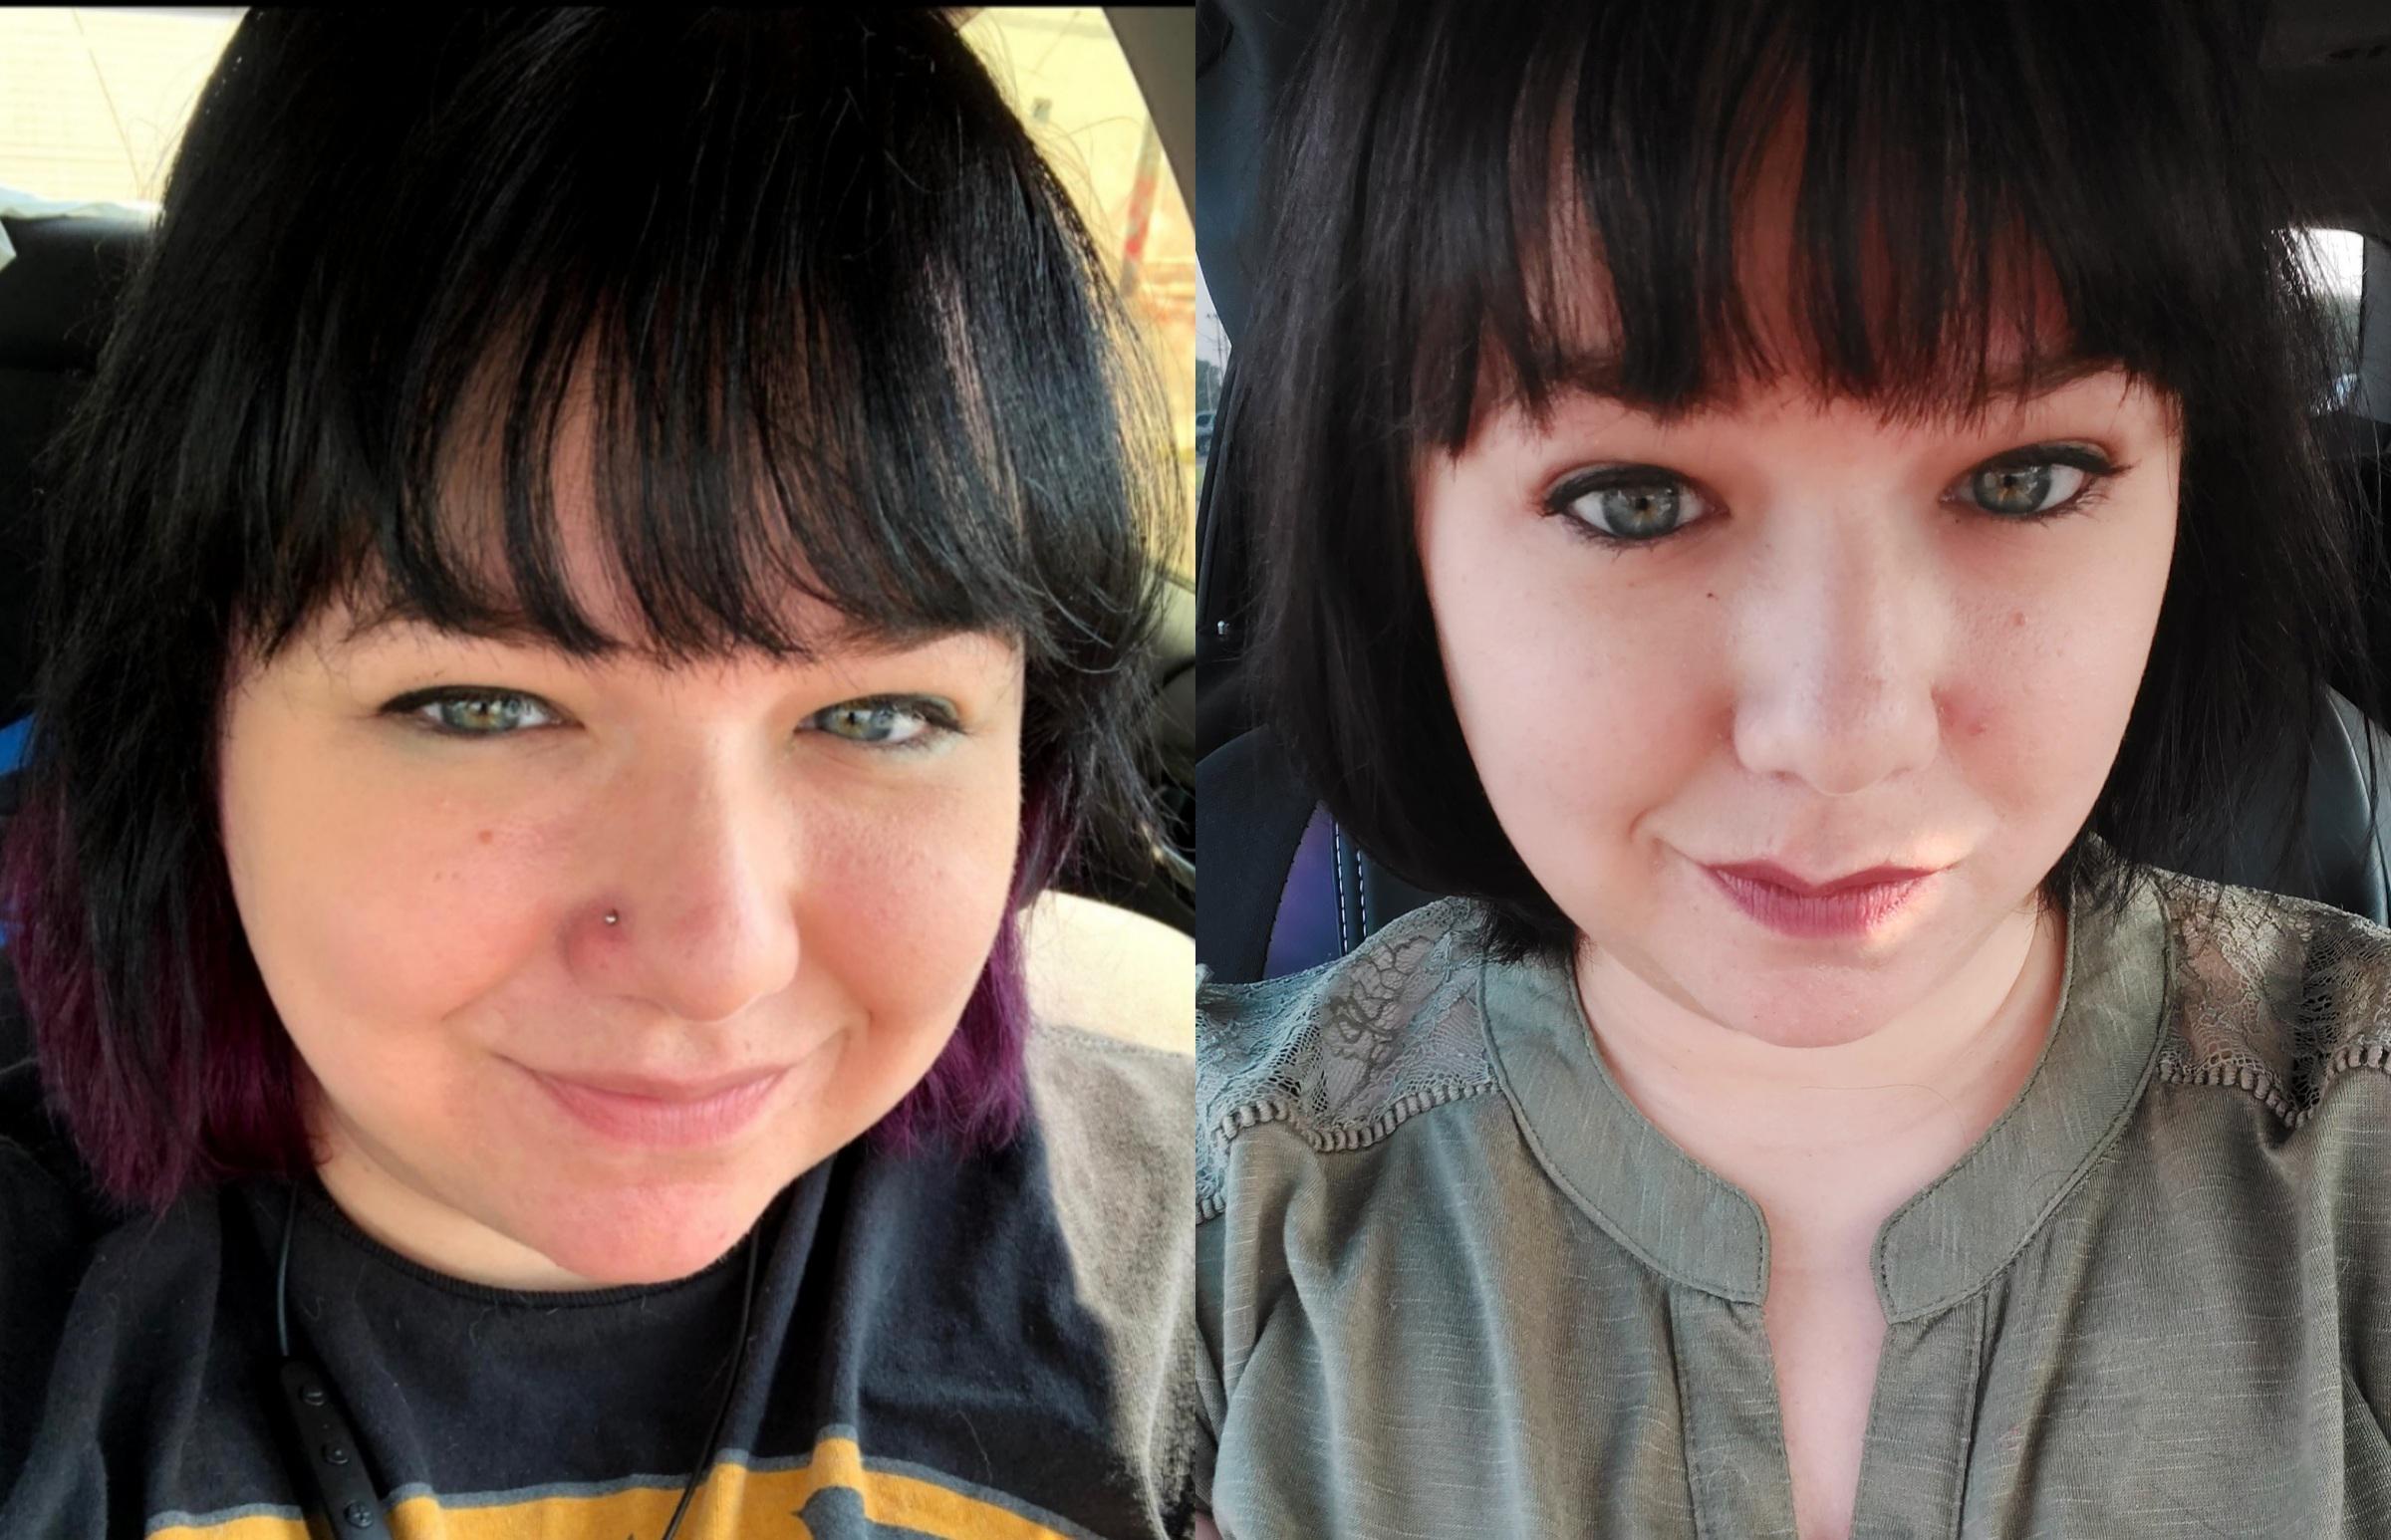 5'3 Female Progress Pics of 41 lbs Weight Loss 217 lbs to 176 lbs